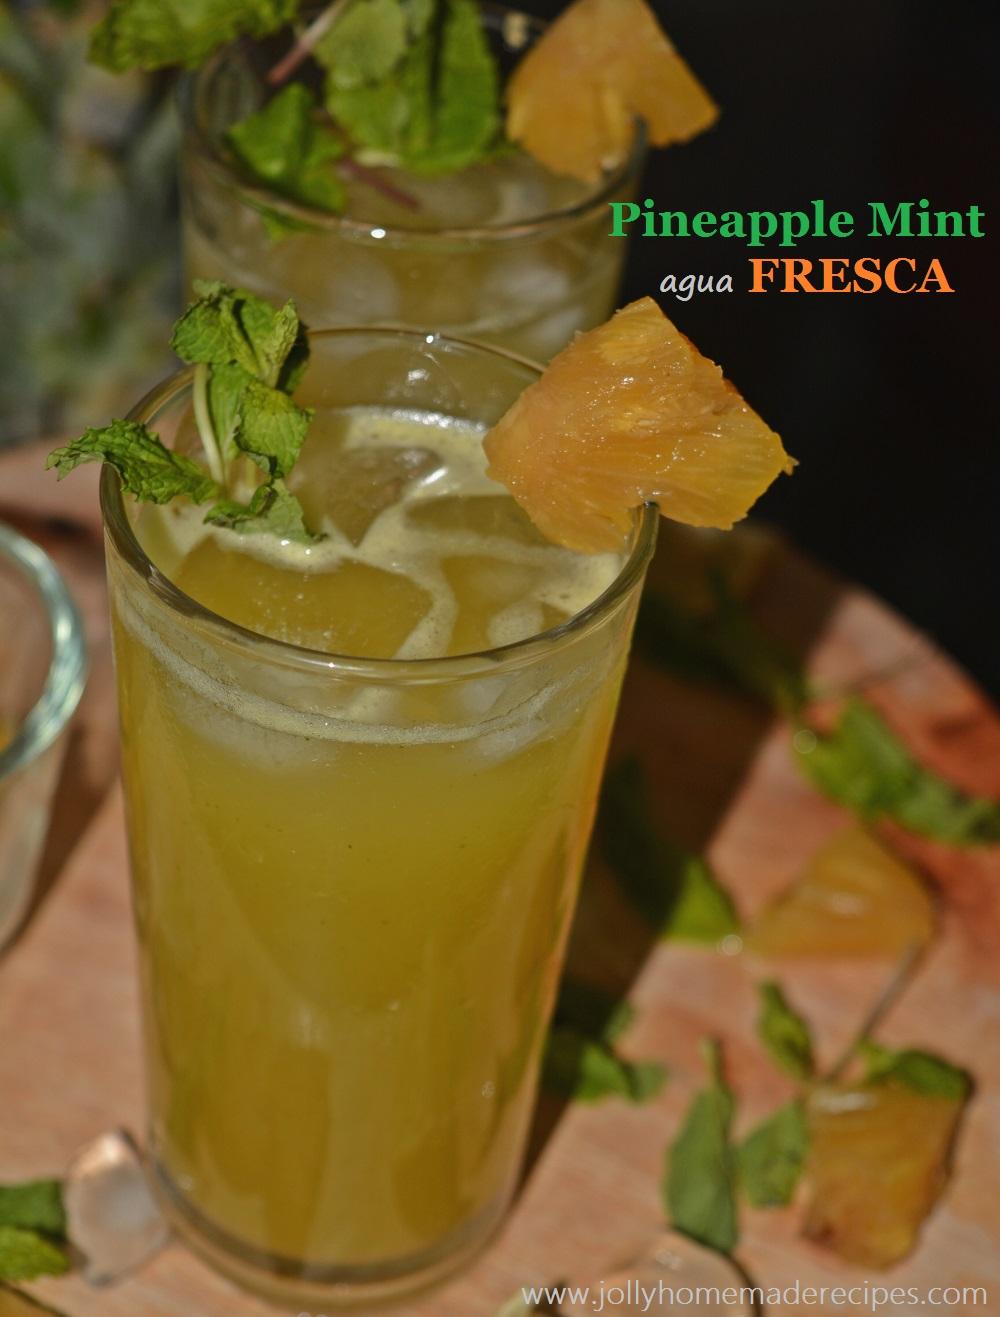 Pineapple Mint Agua Fresca